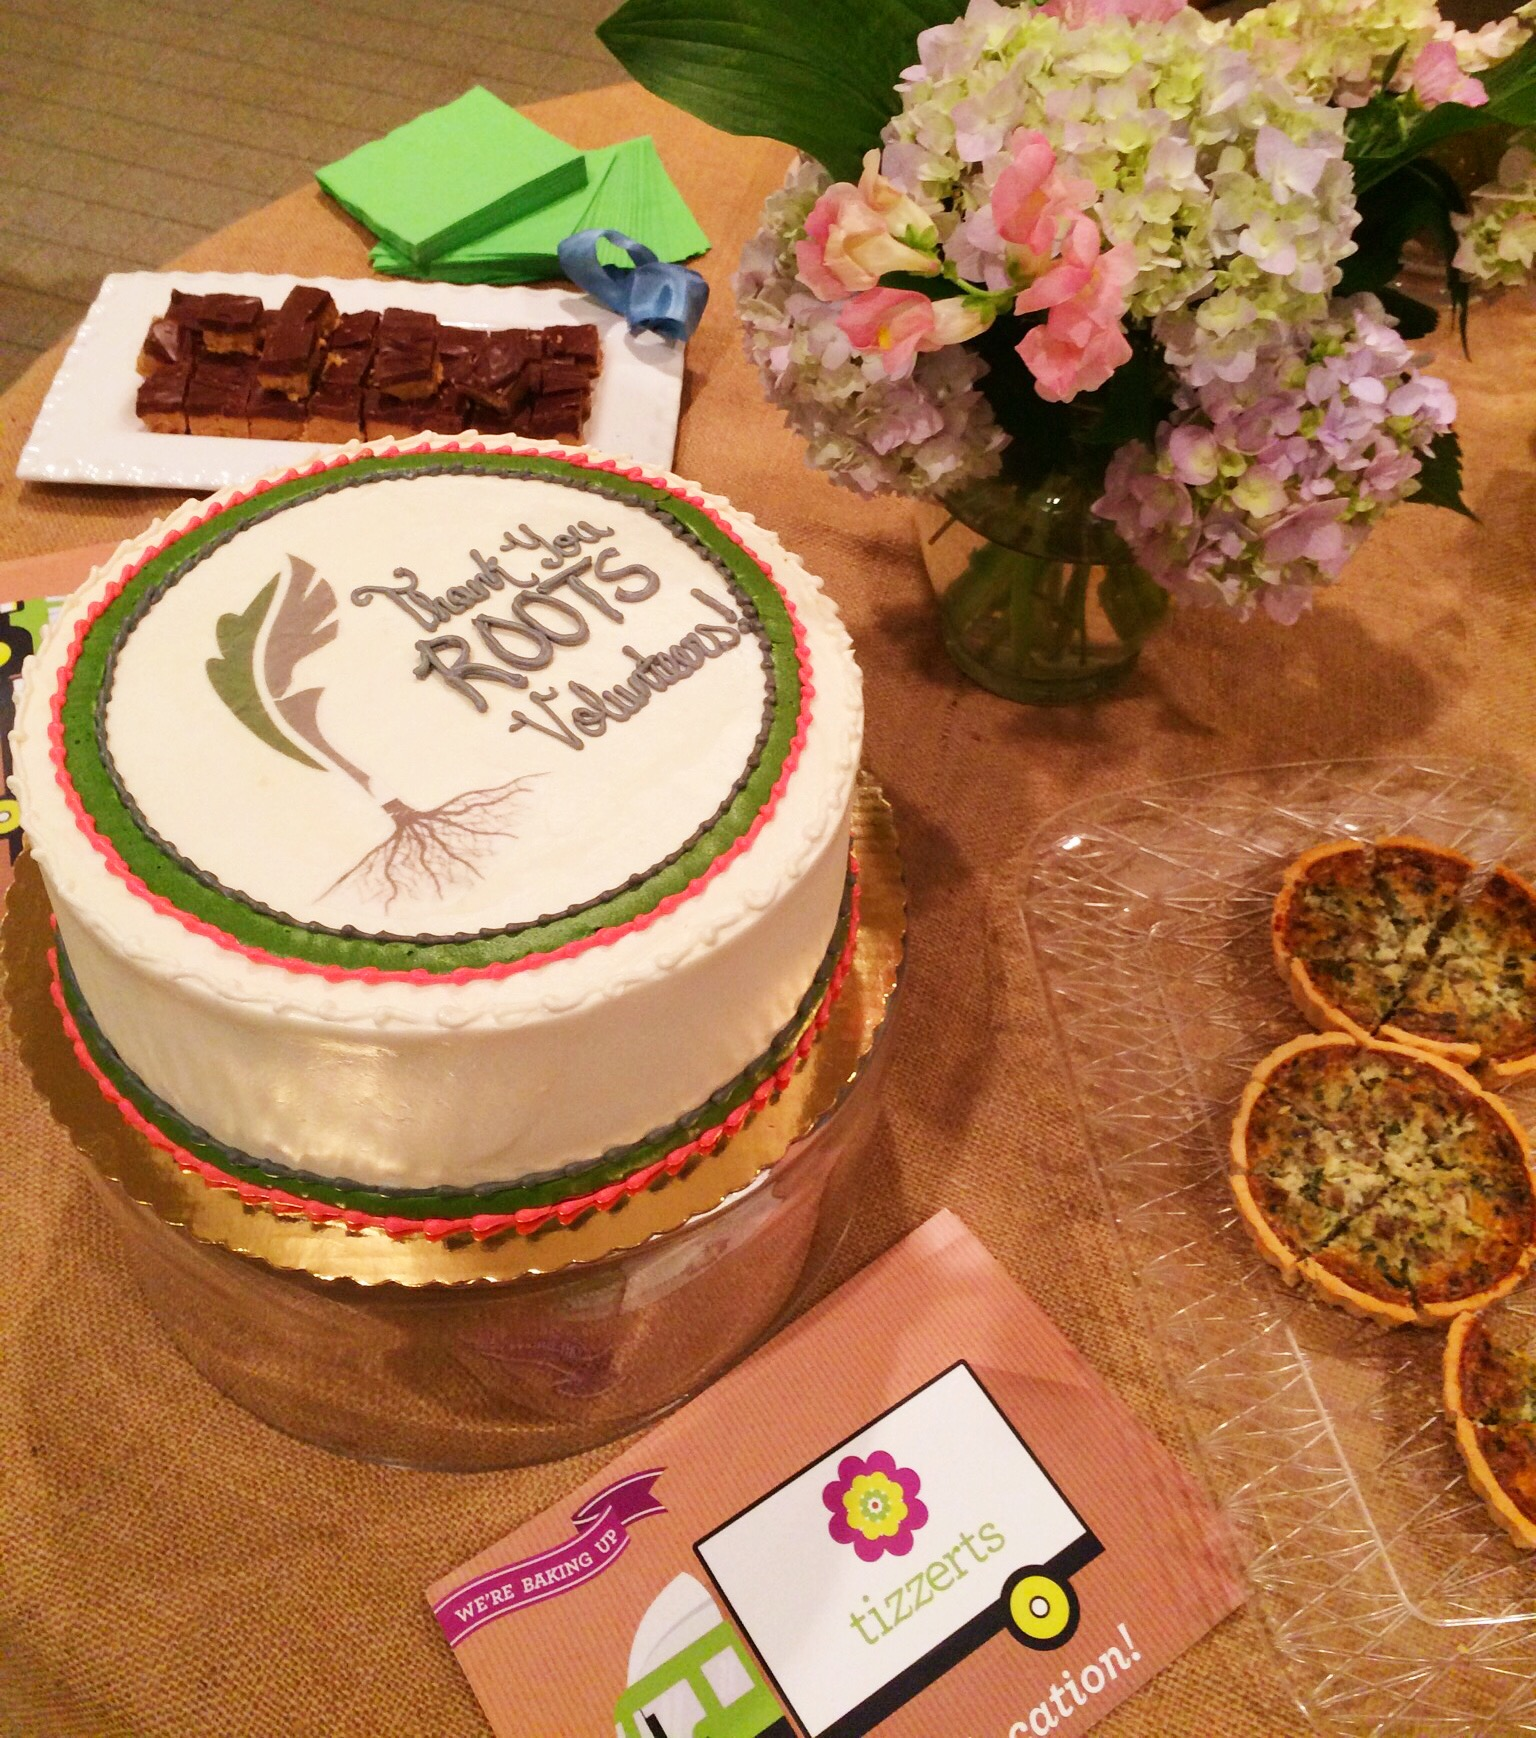 Tizzerts Cake Table.jpeg